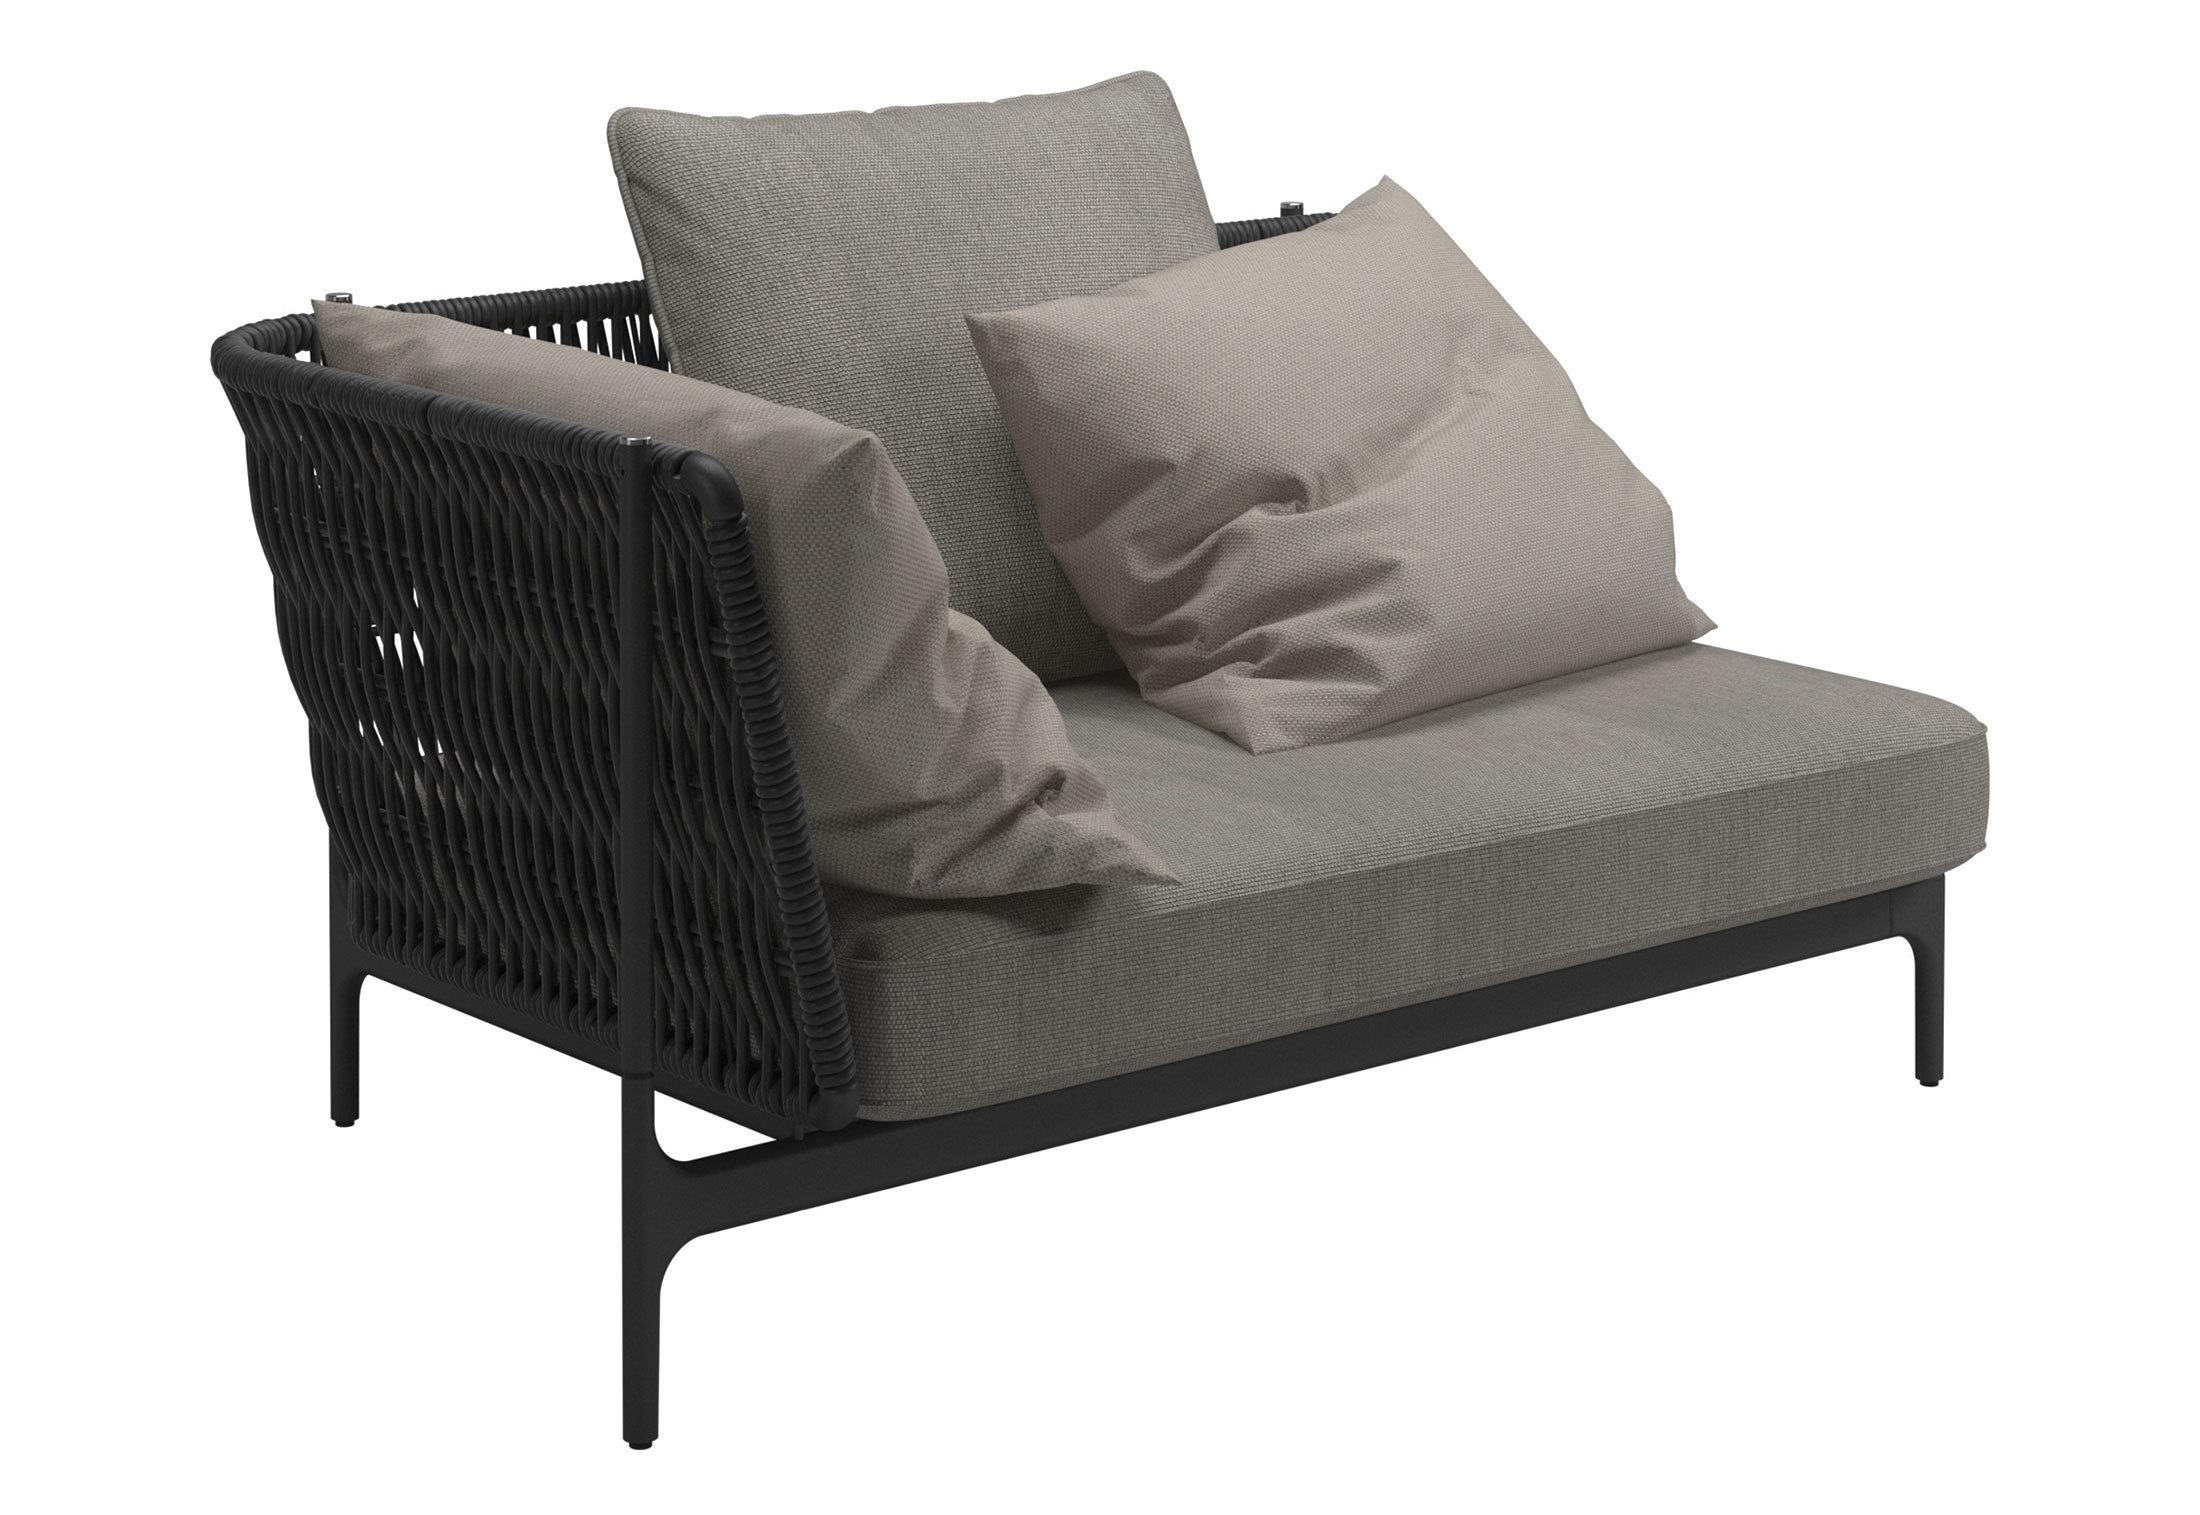 Grand Weave Left Corner Unitgloster Furniture   Stylepark Within Sofa Corner Units (View 11 of 24)